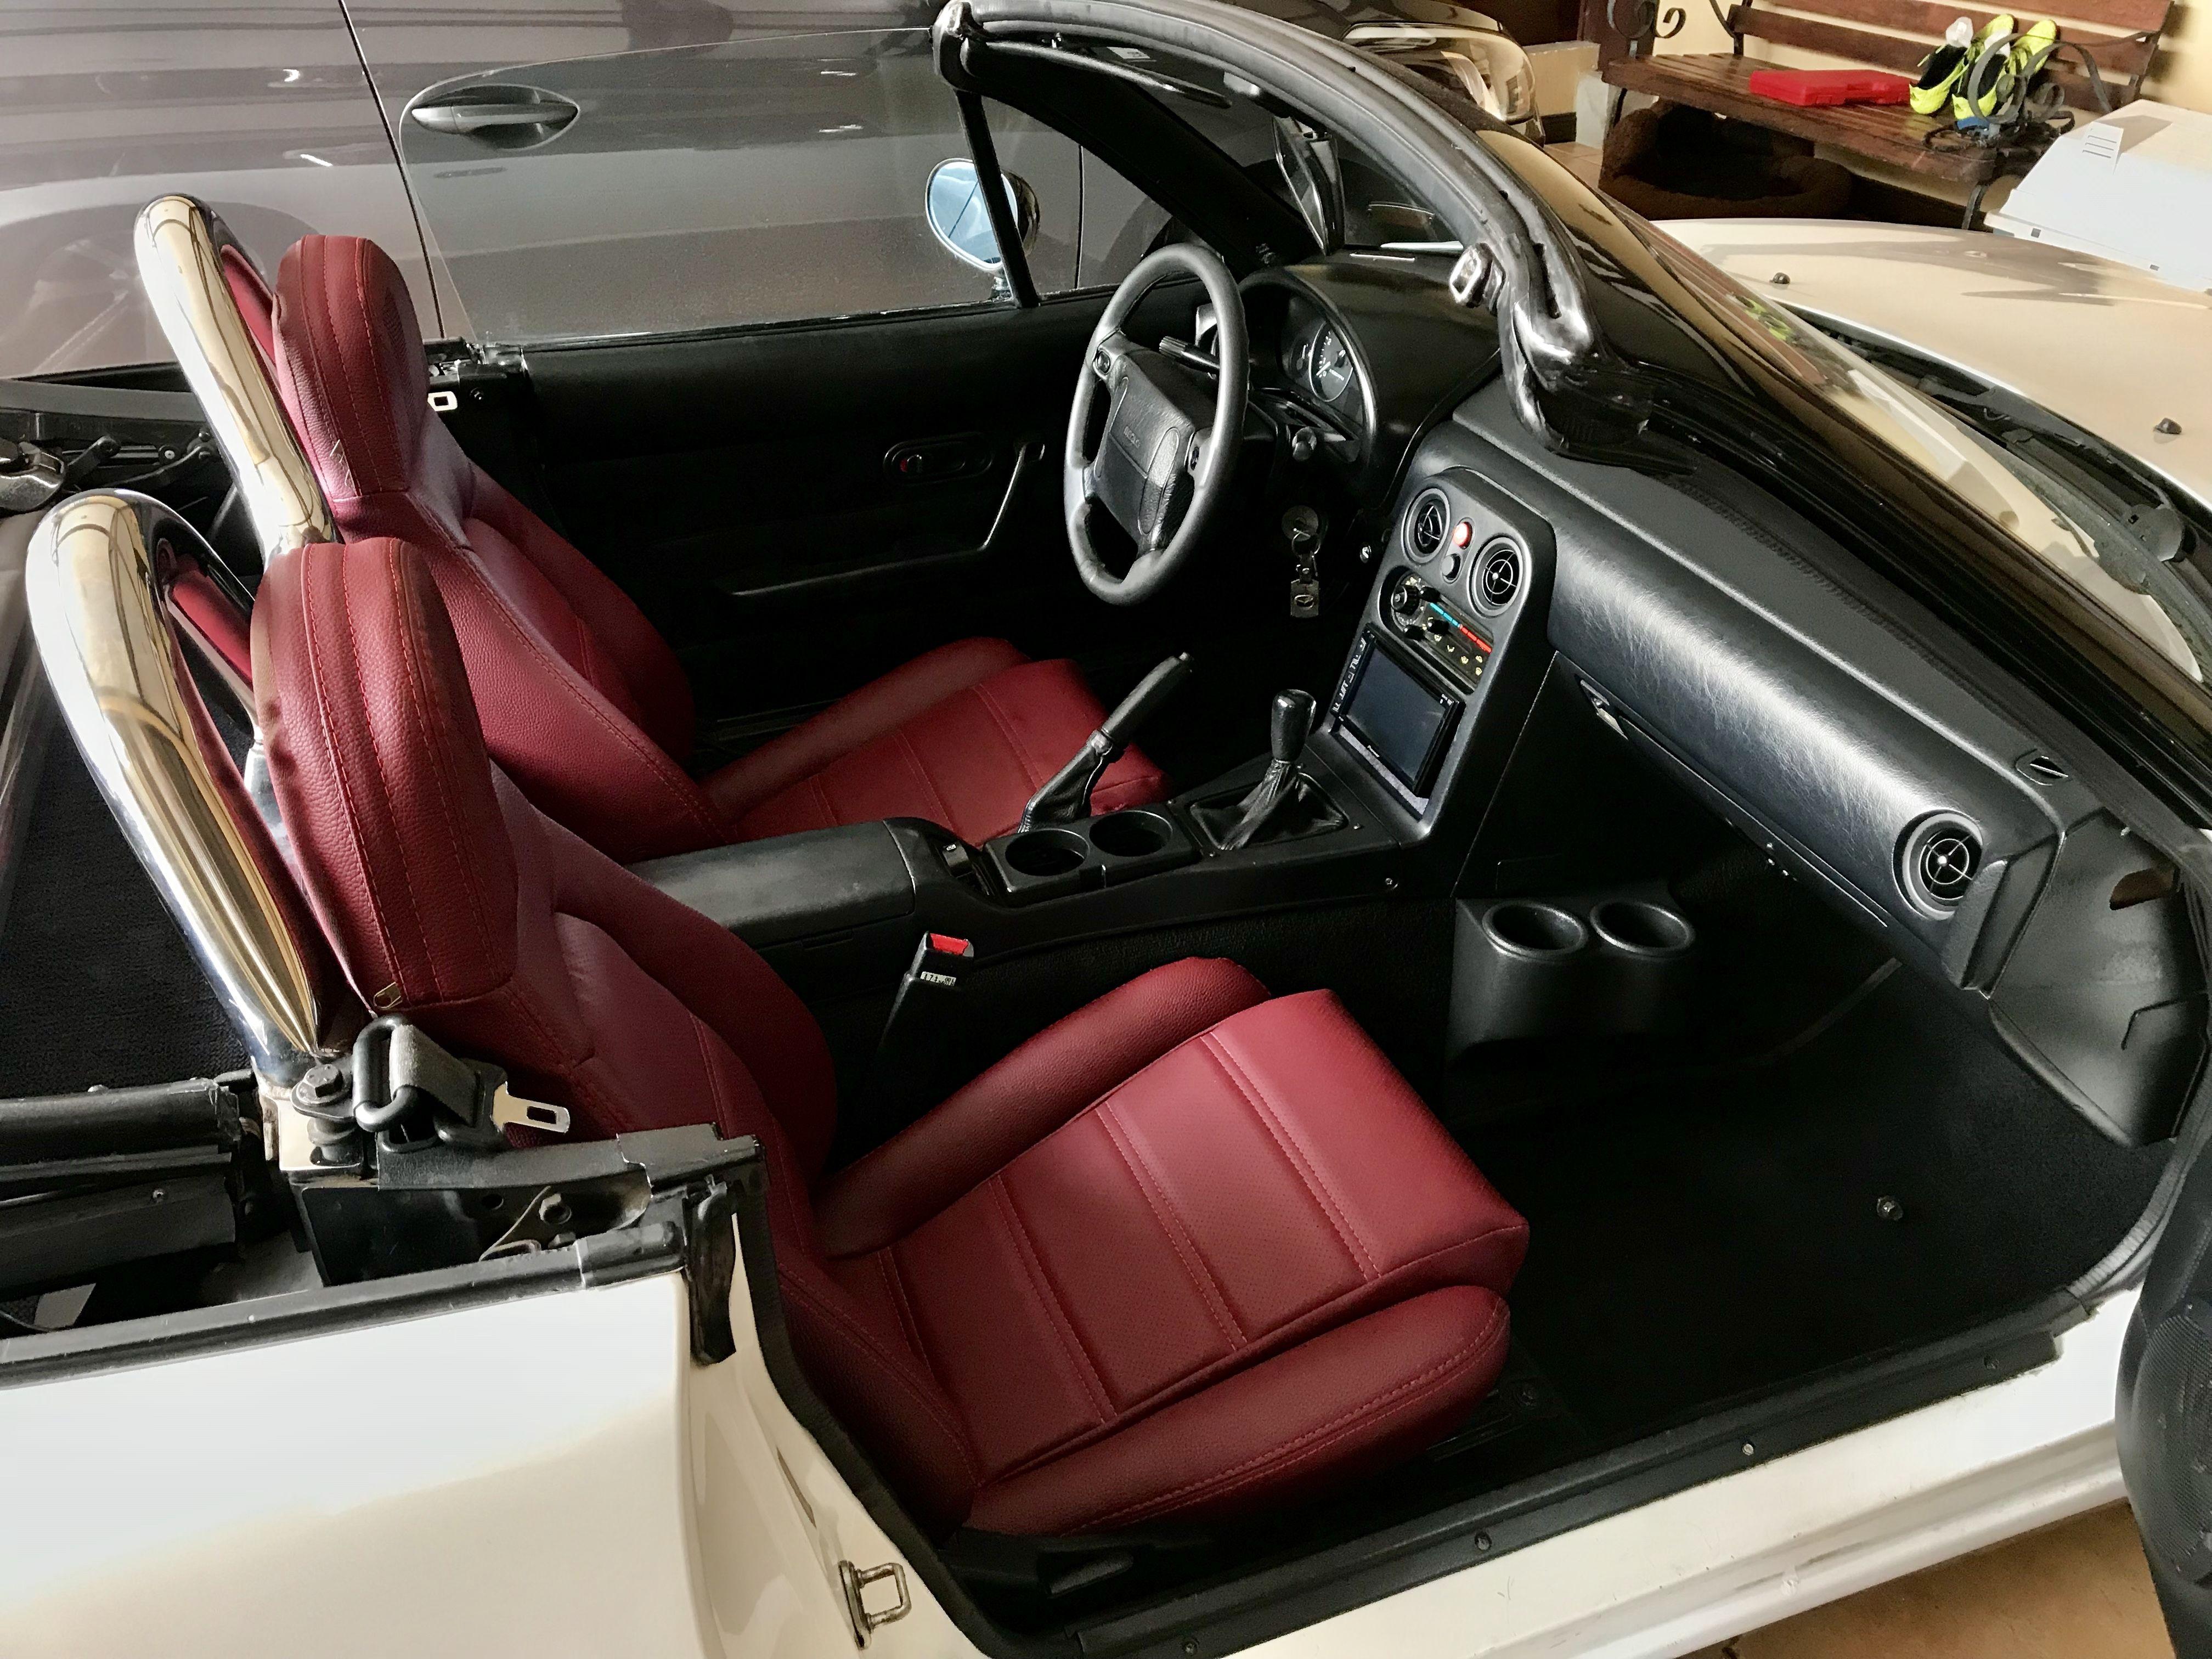 mazda miata mx5 red leather seats miata mx5 cars interiors miata always mx 5 mazda cars. Black Bedroom Furniture Sets. Home Design Ideas